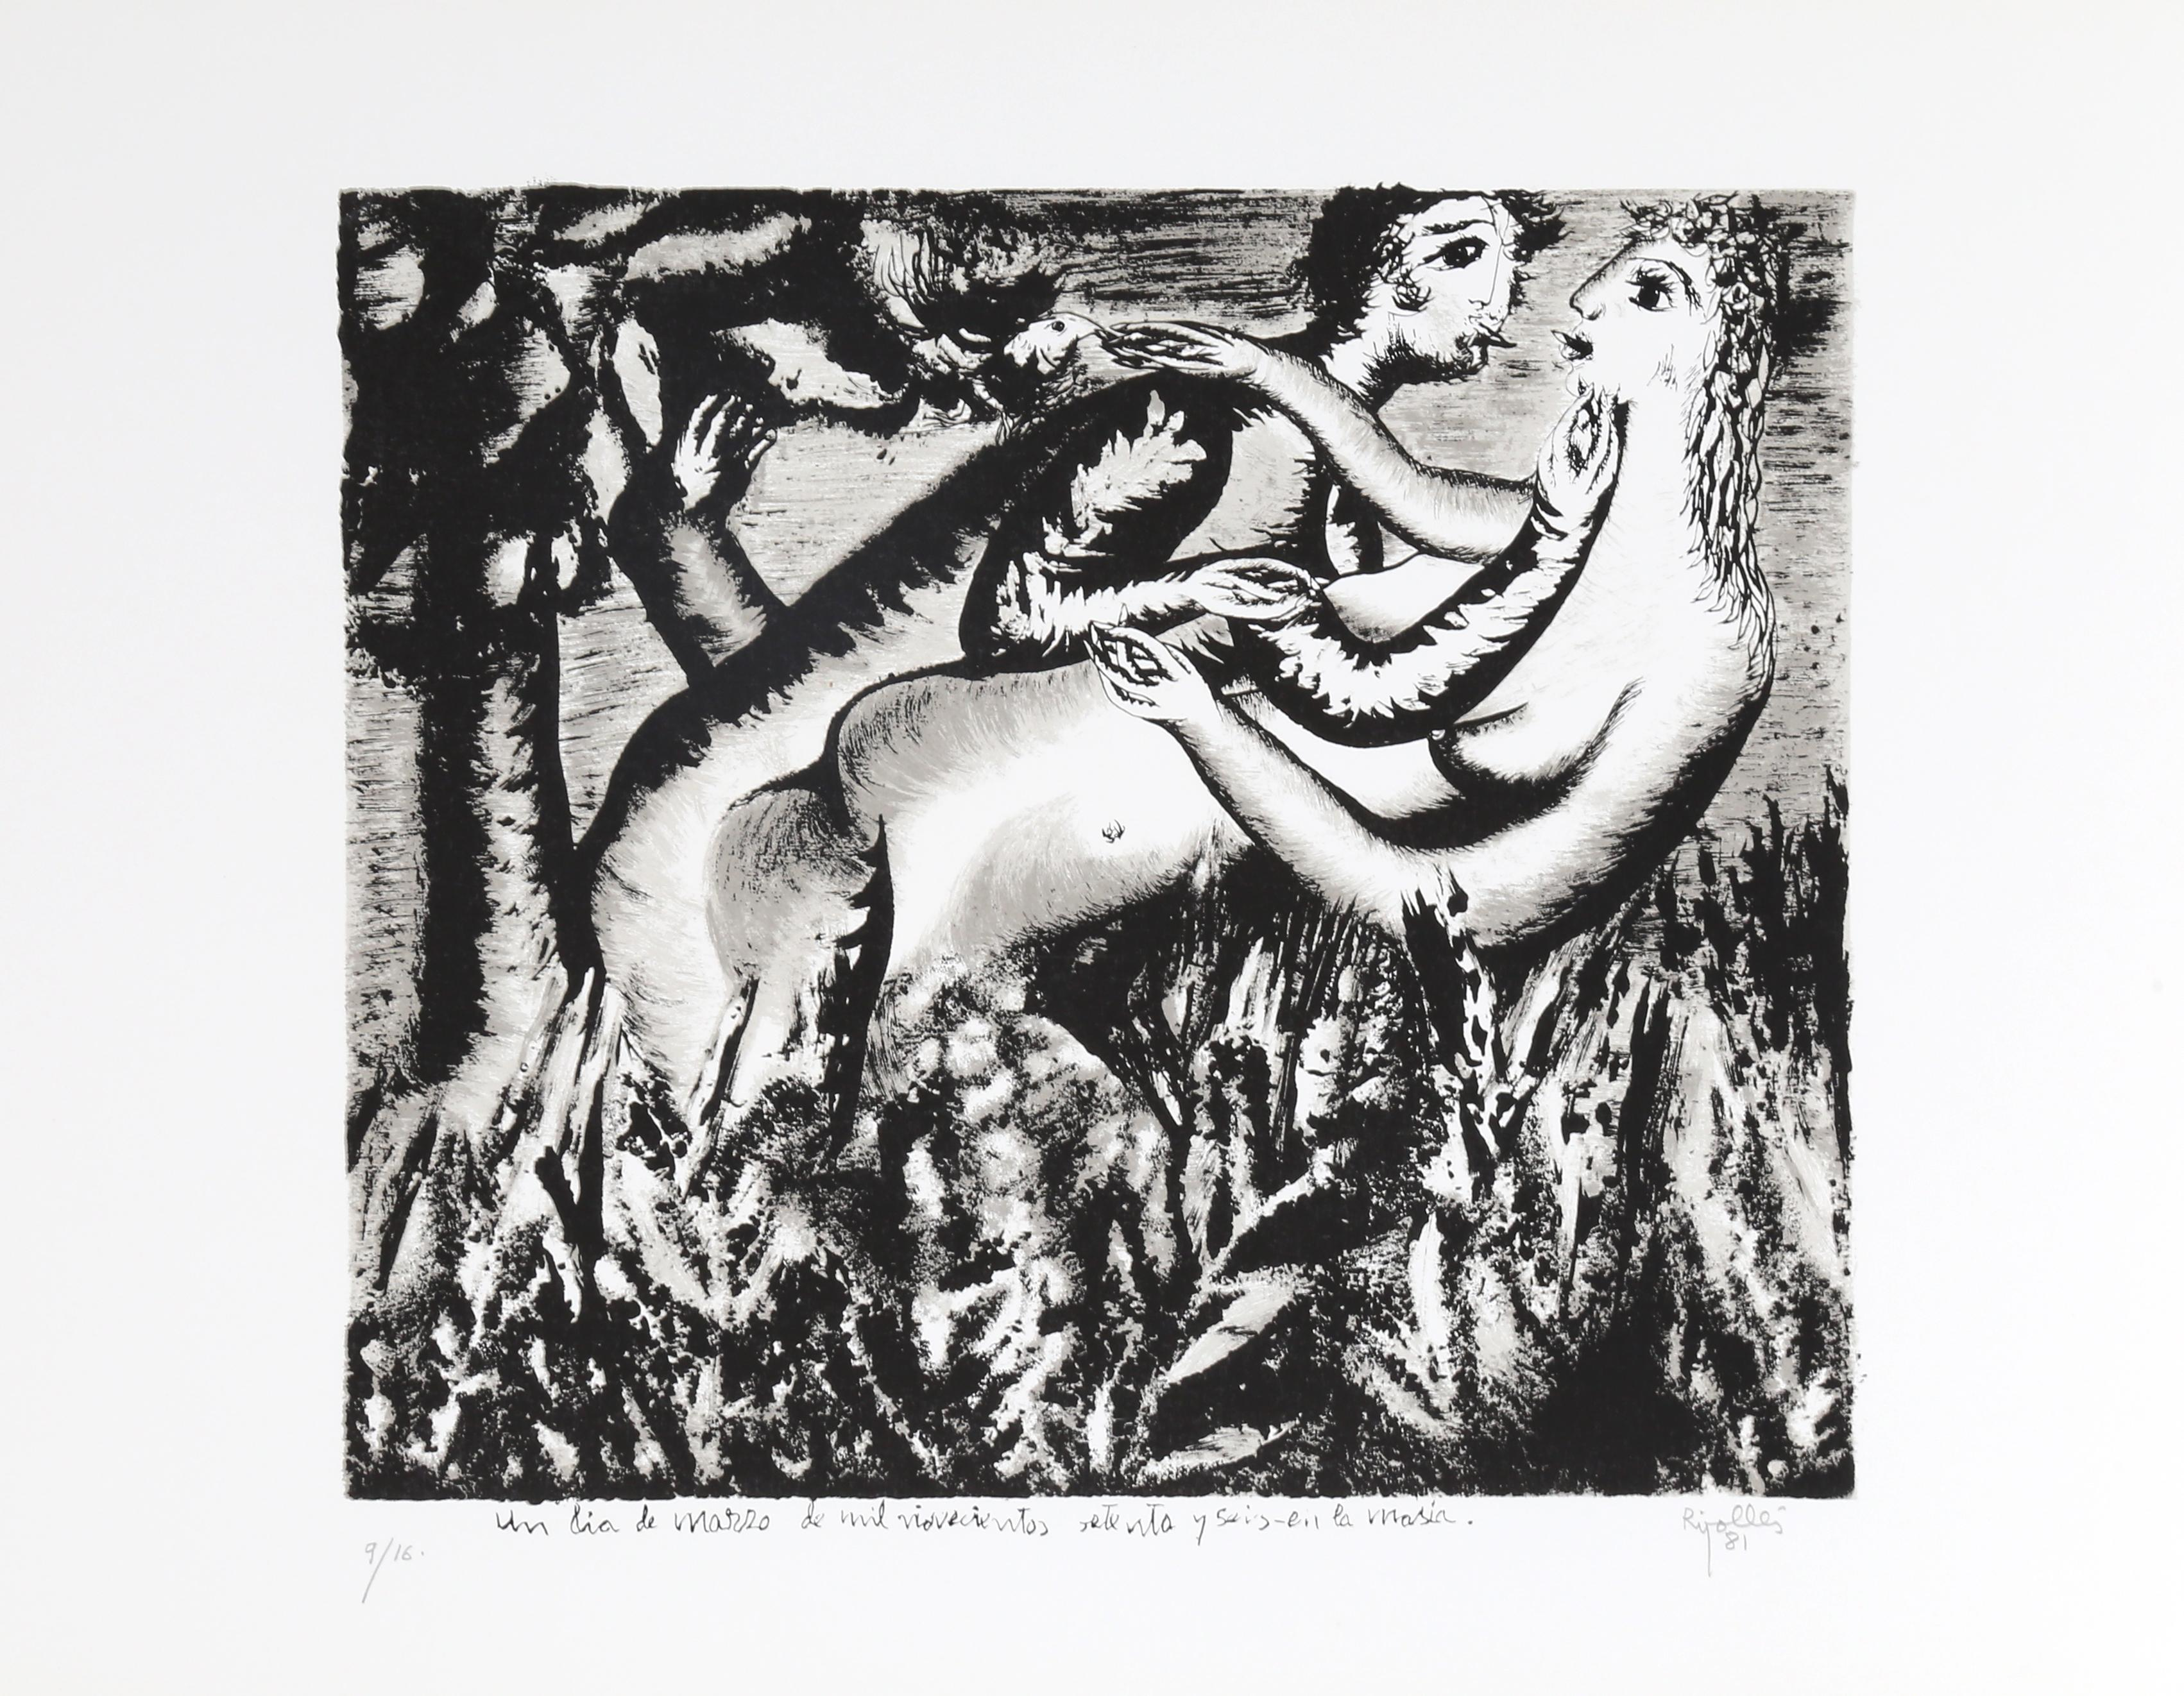 Un Dia de Marzo, 1981 by Juan Garcia Ripolles